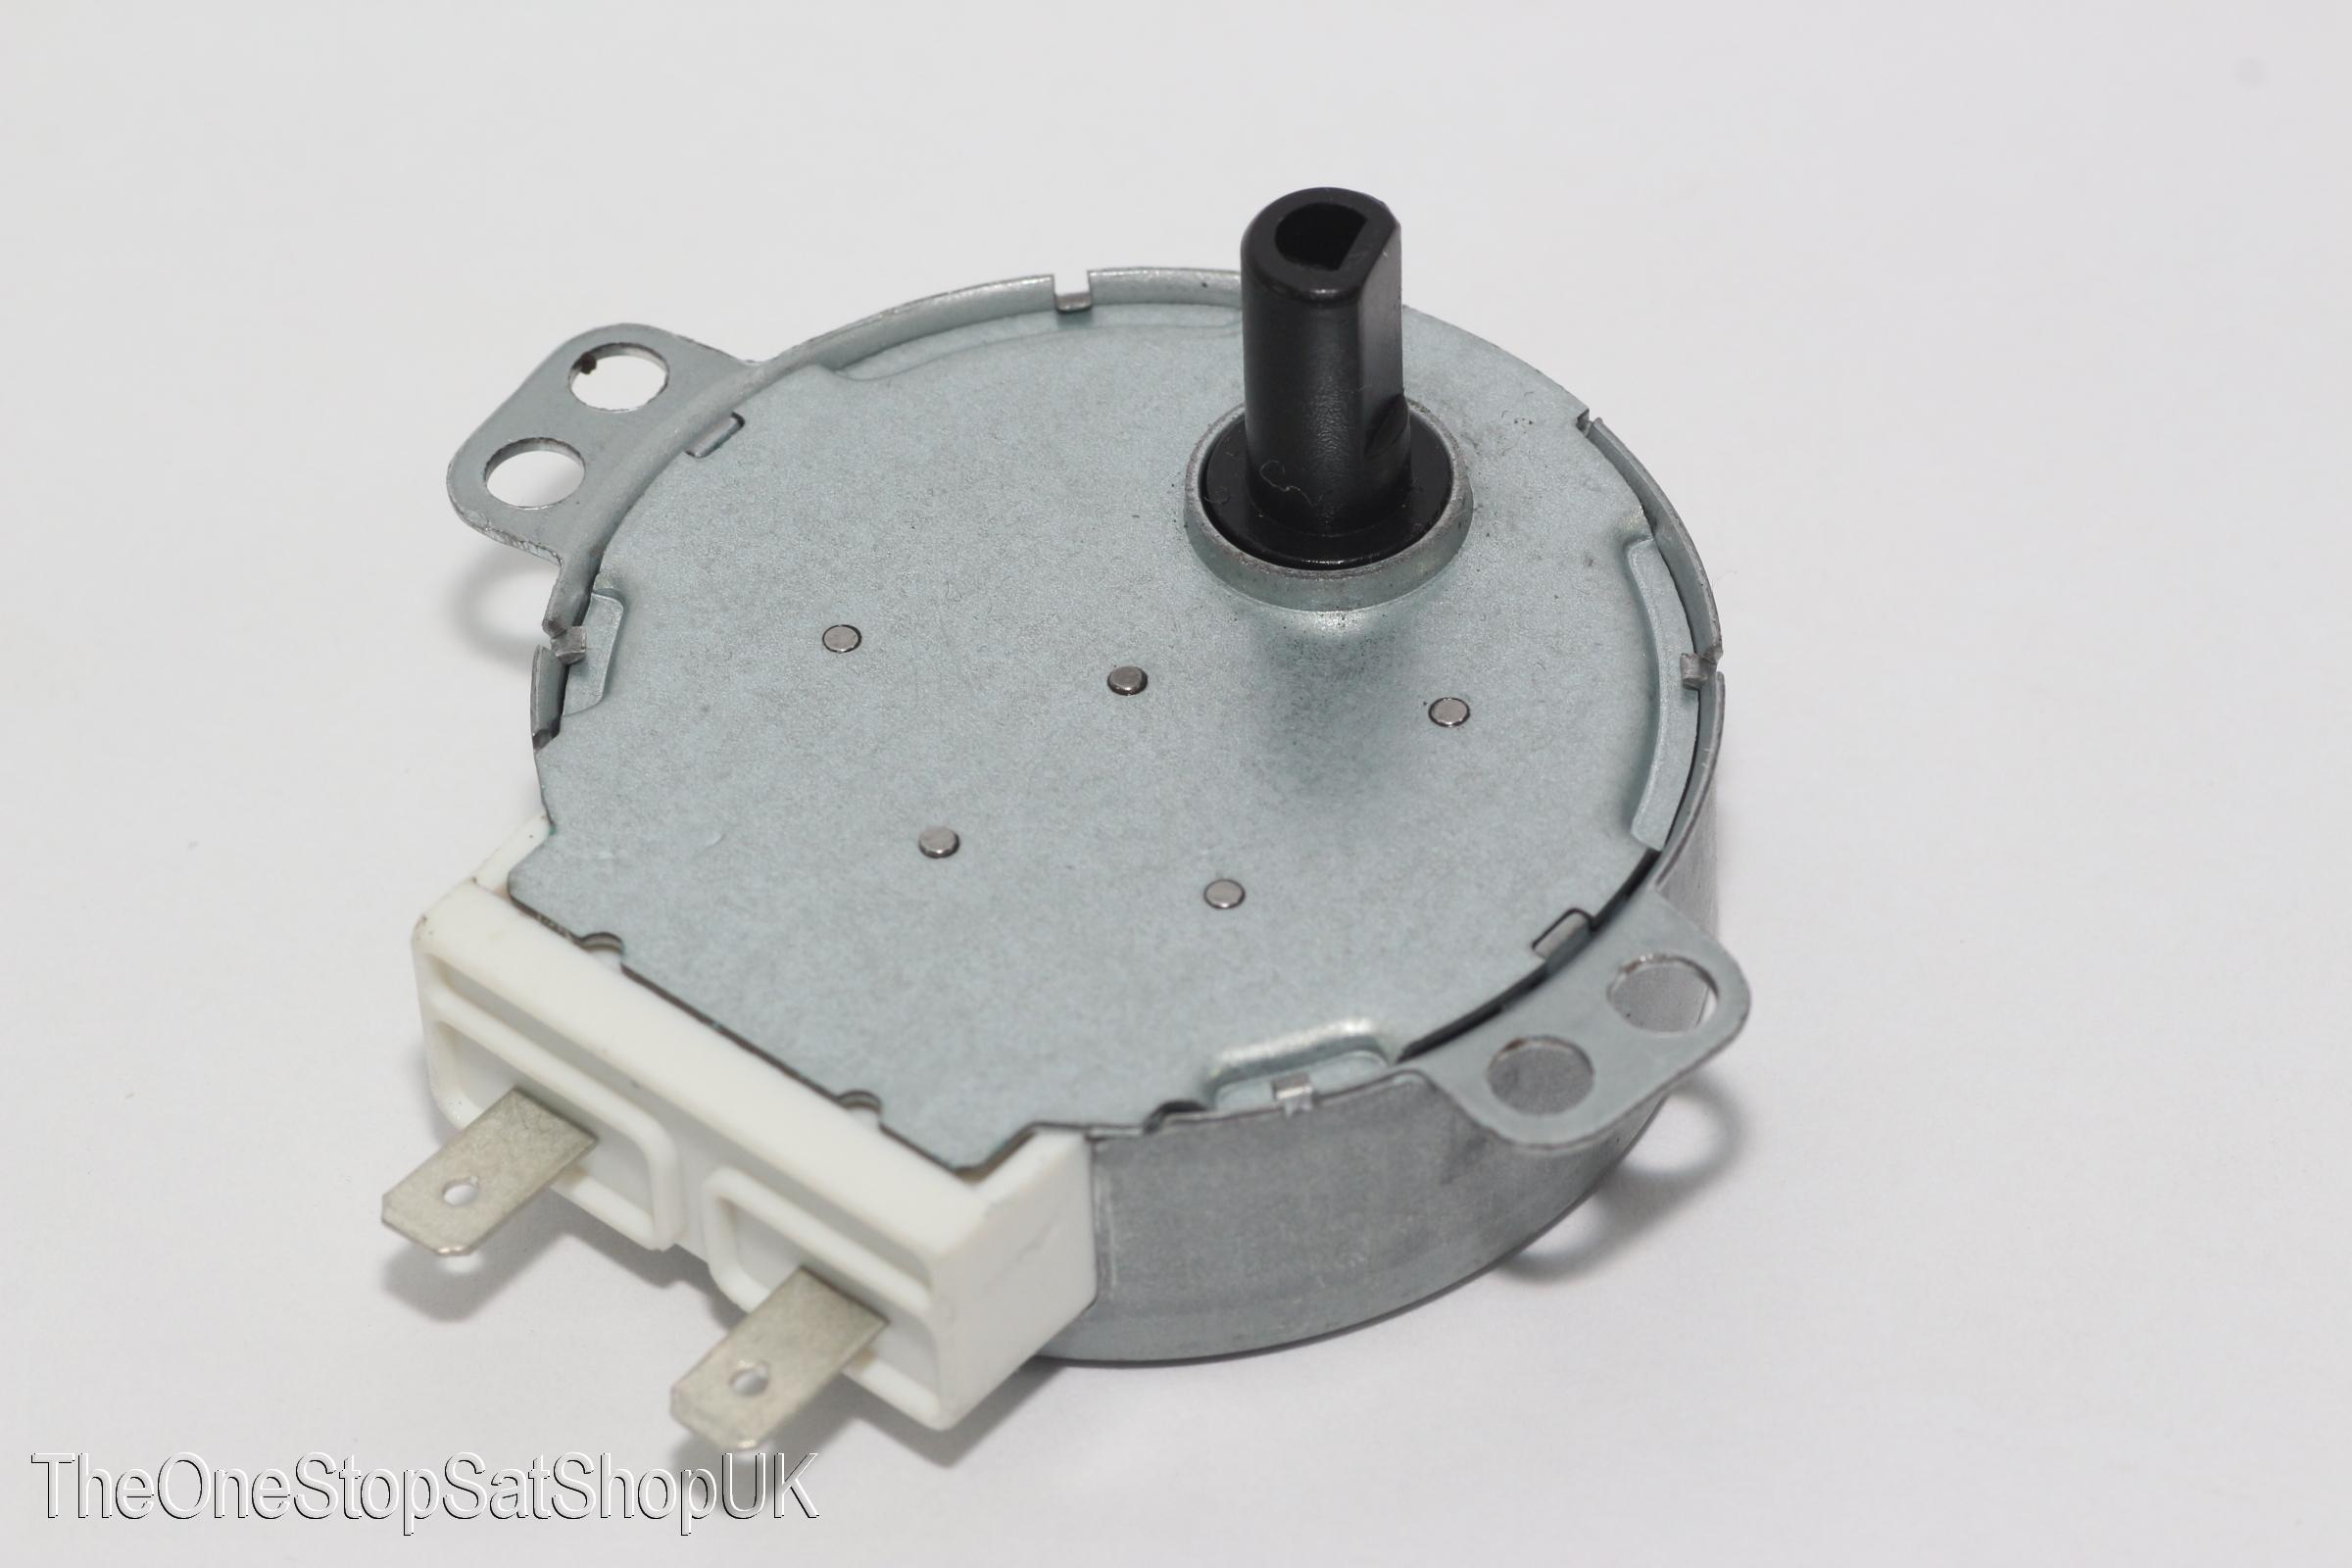 Galanz SM-16 E Drehmotor für Mikrowelle